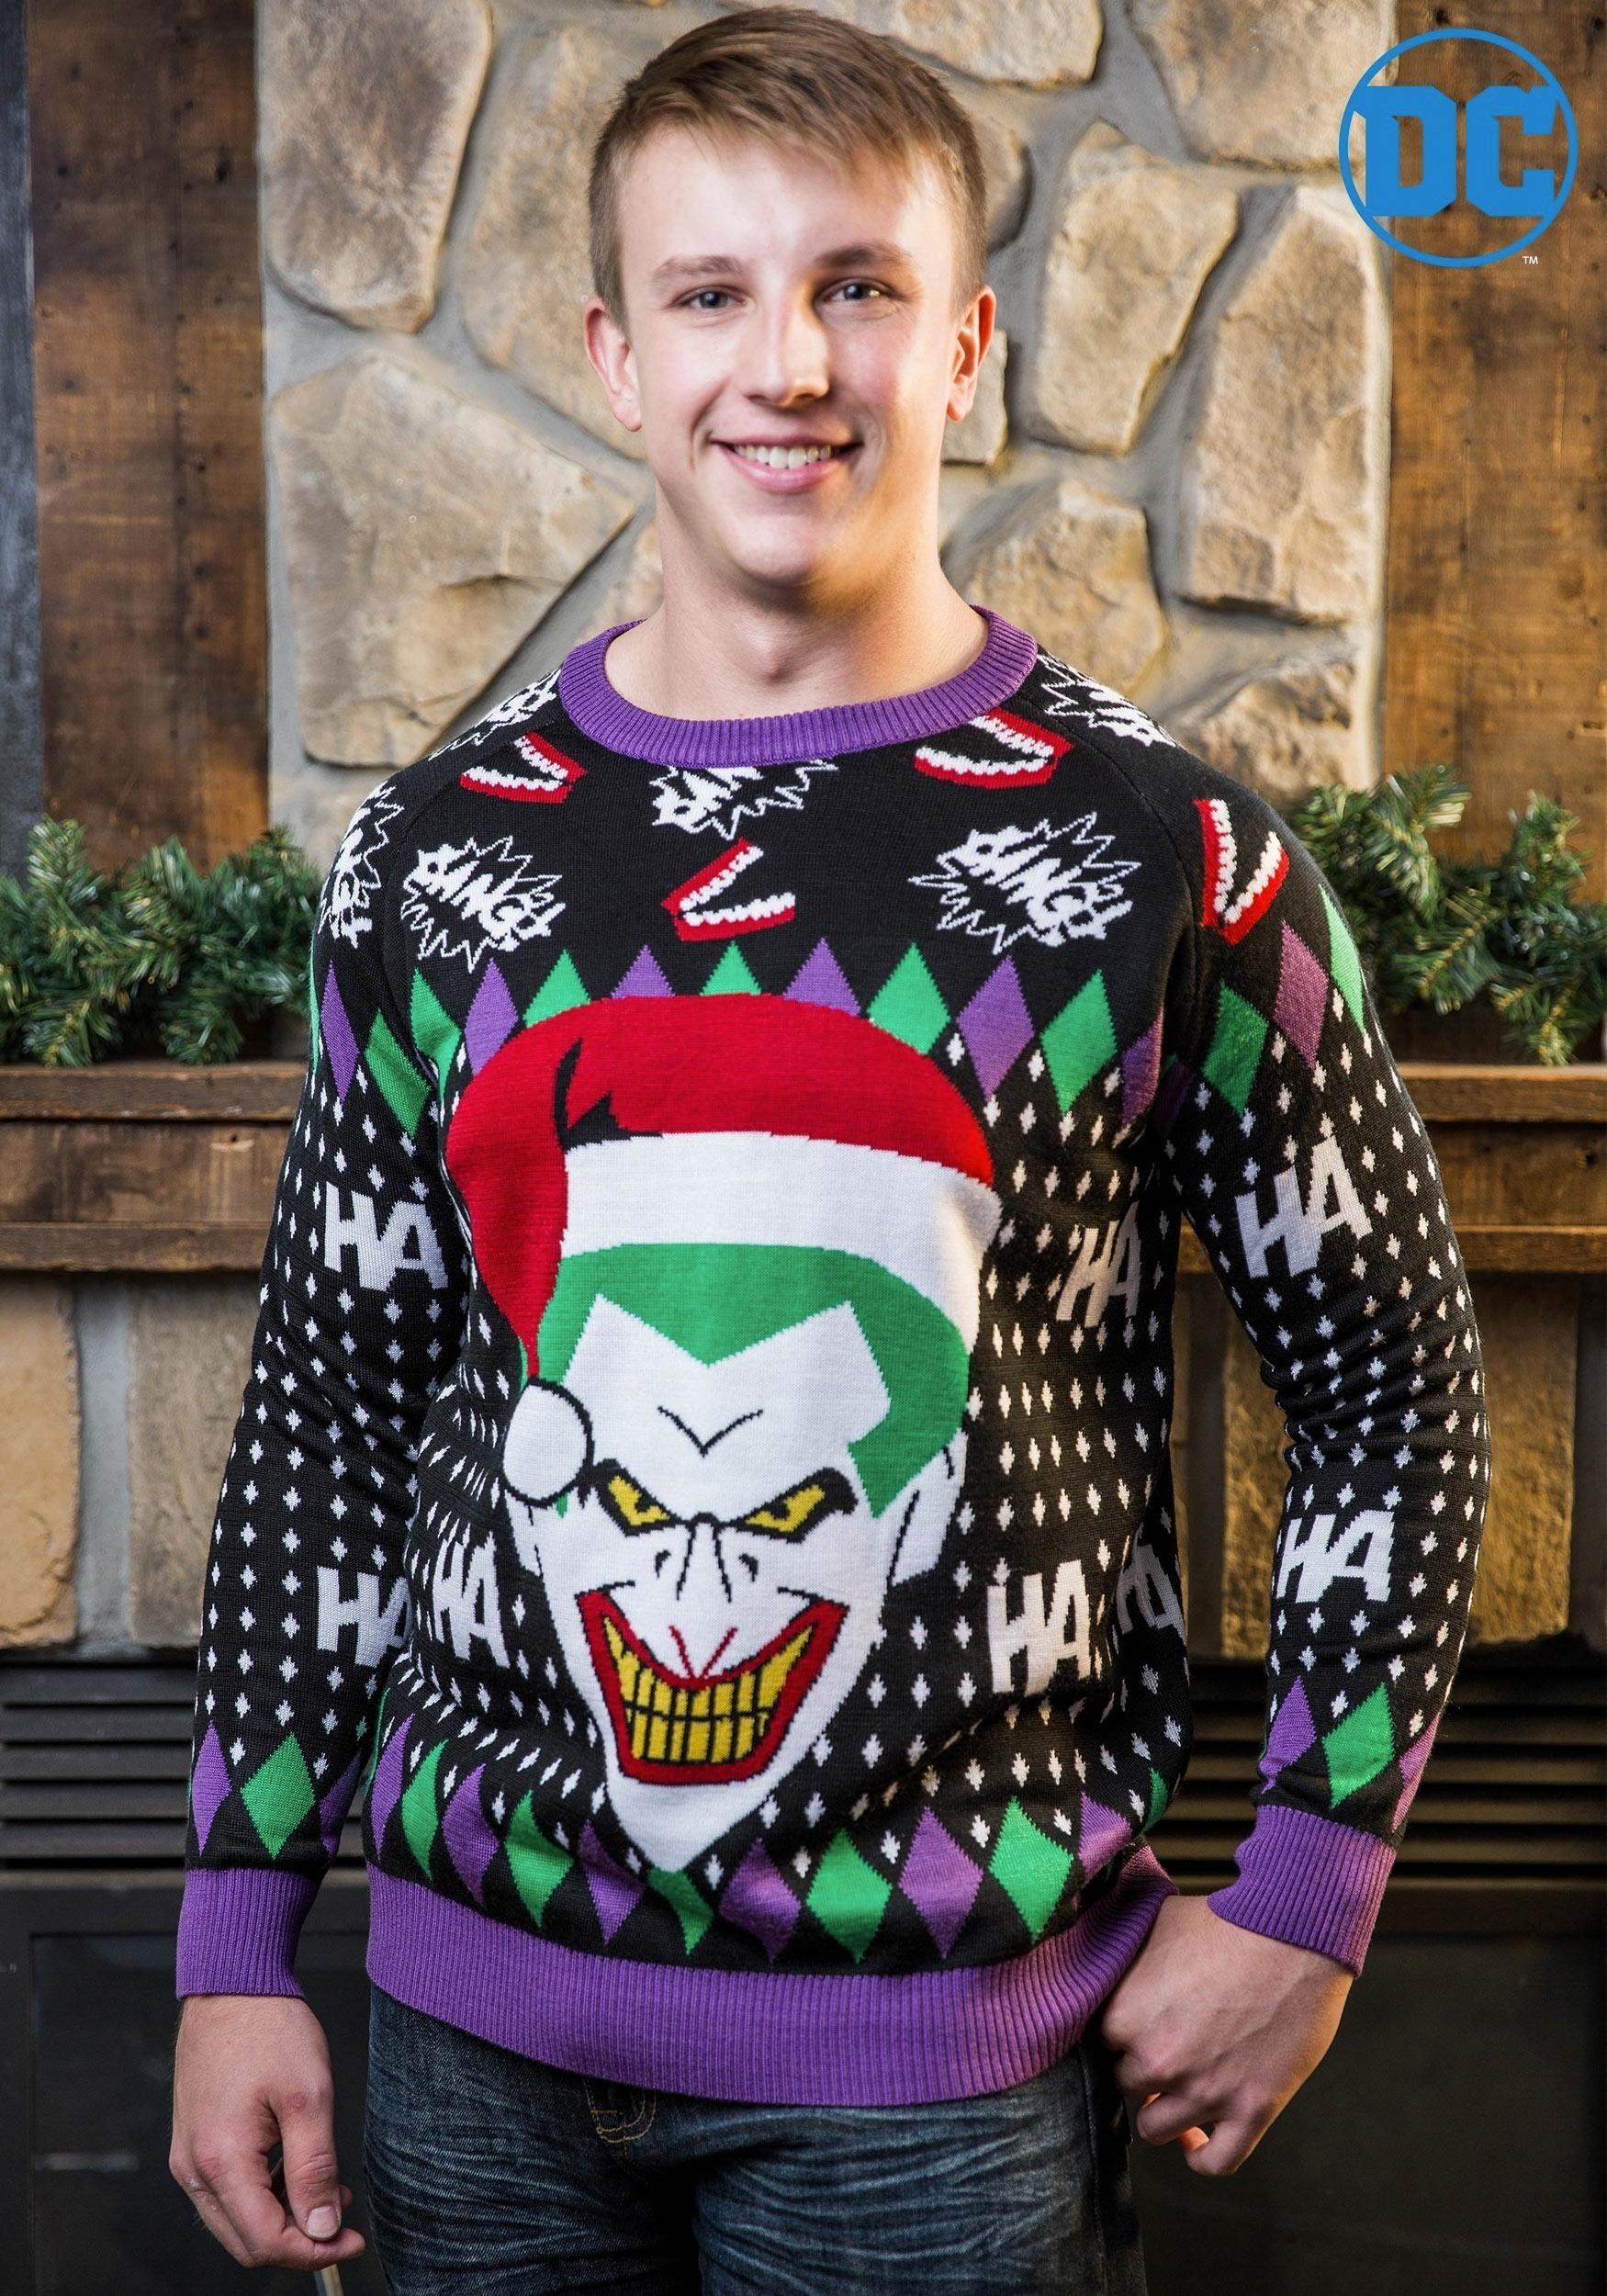 Joker Santa Sweater FUN9129